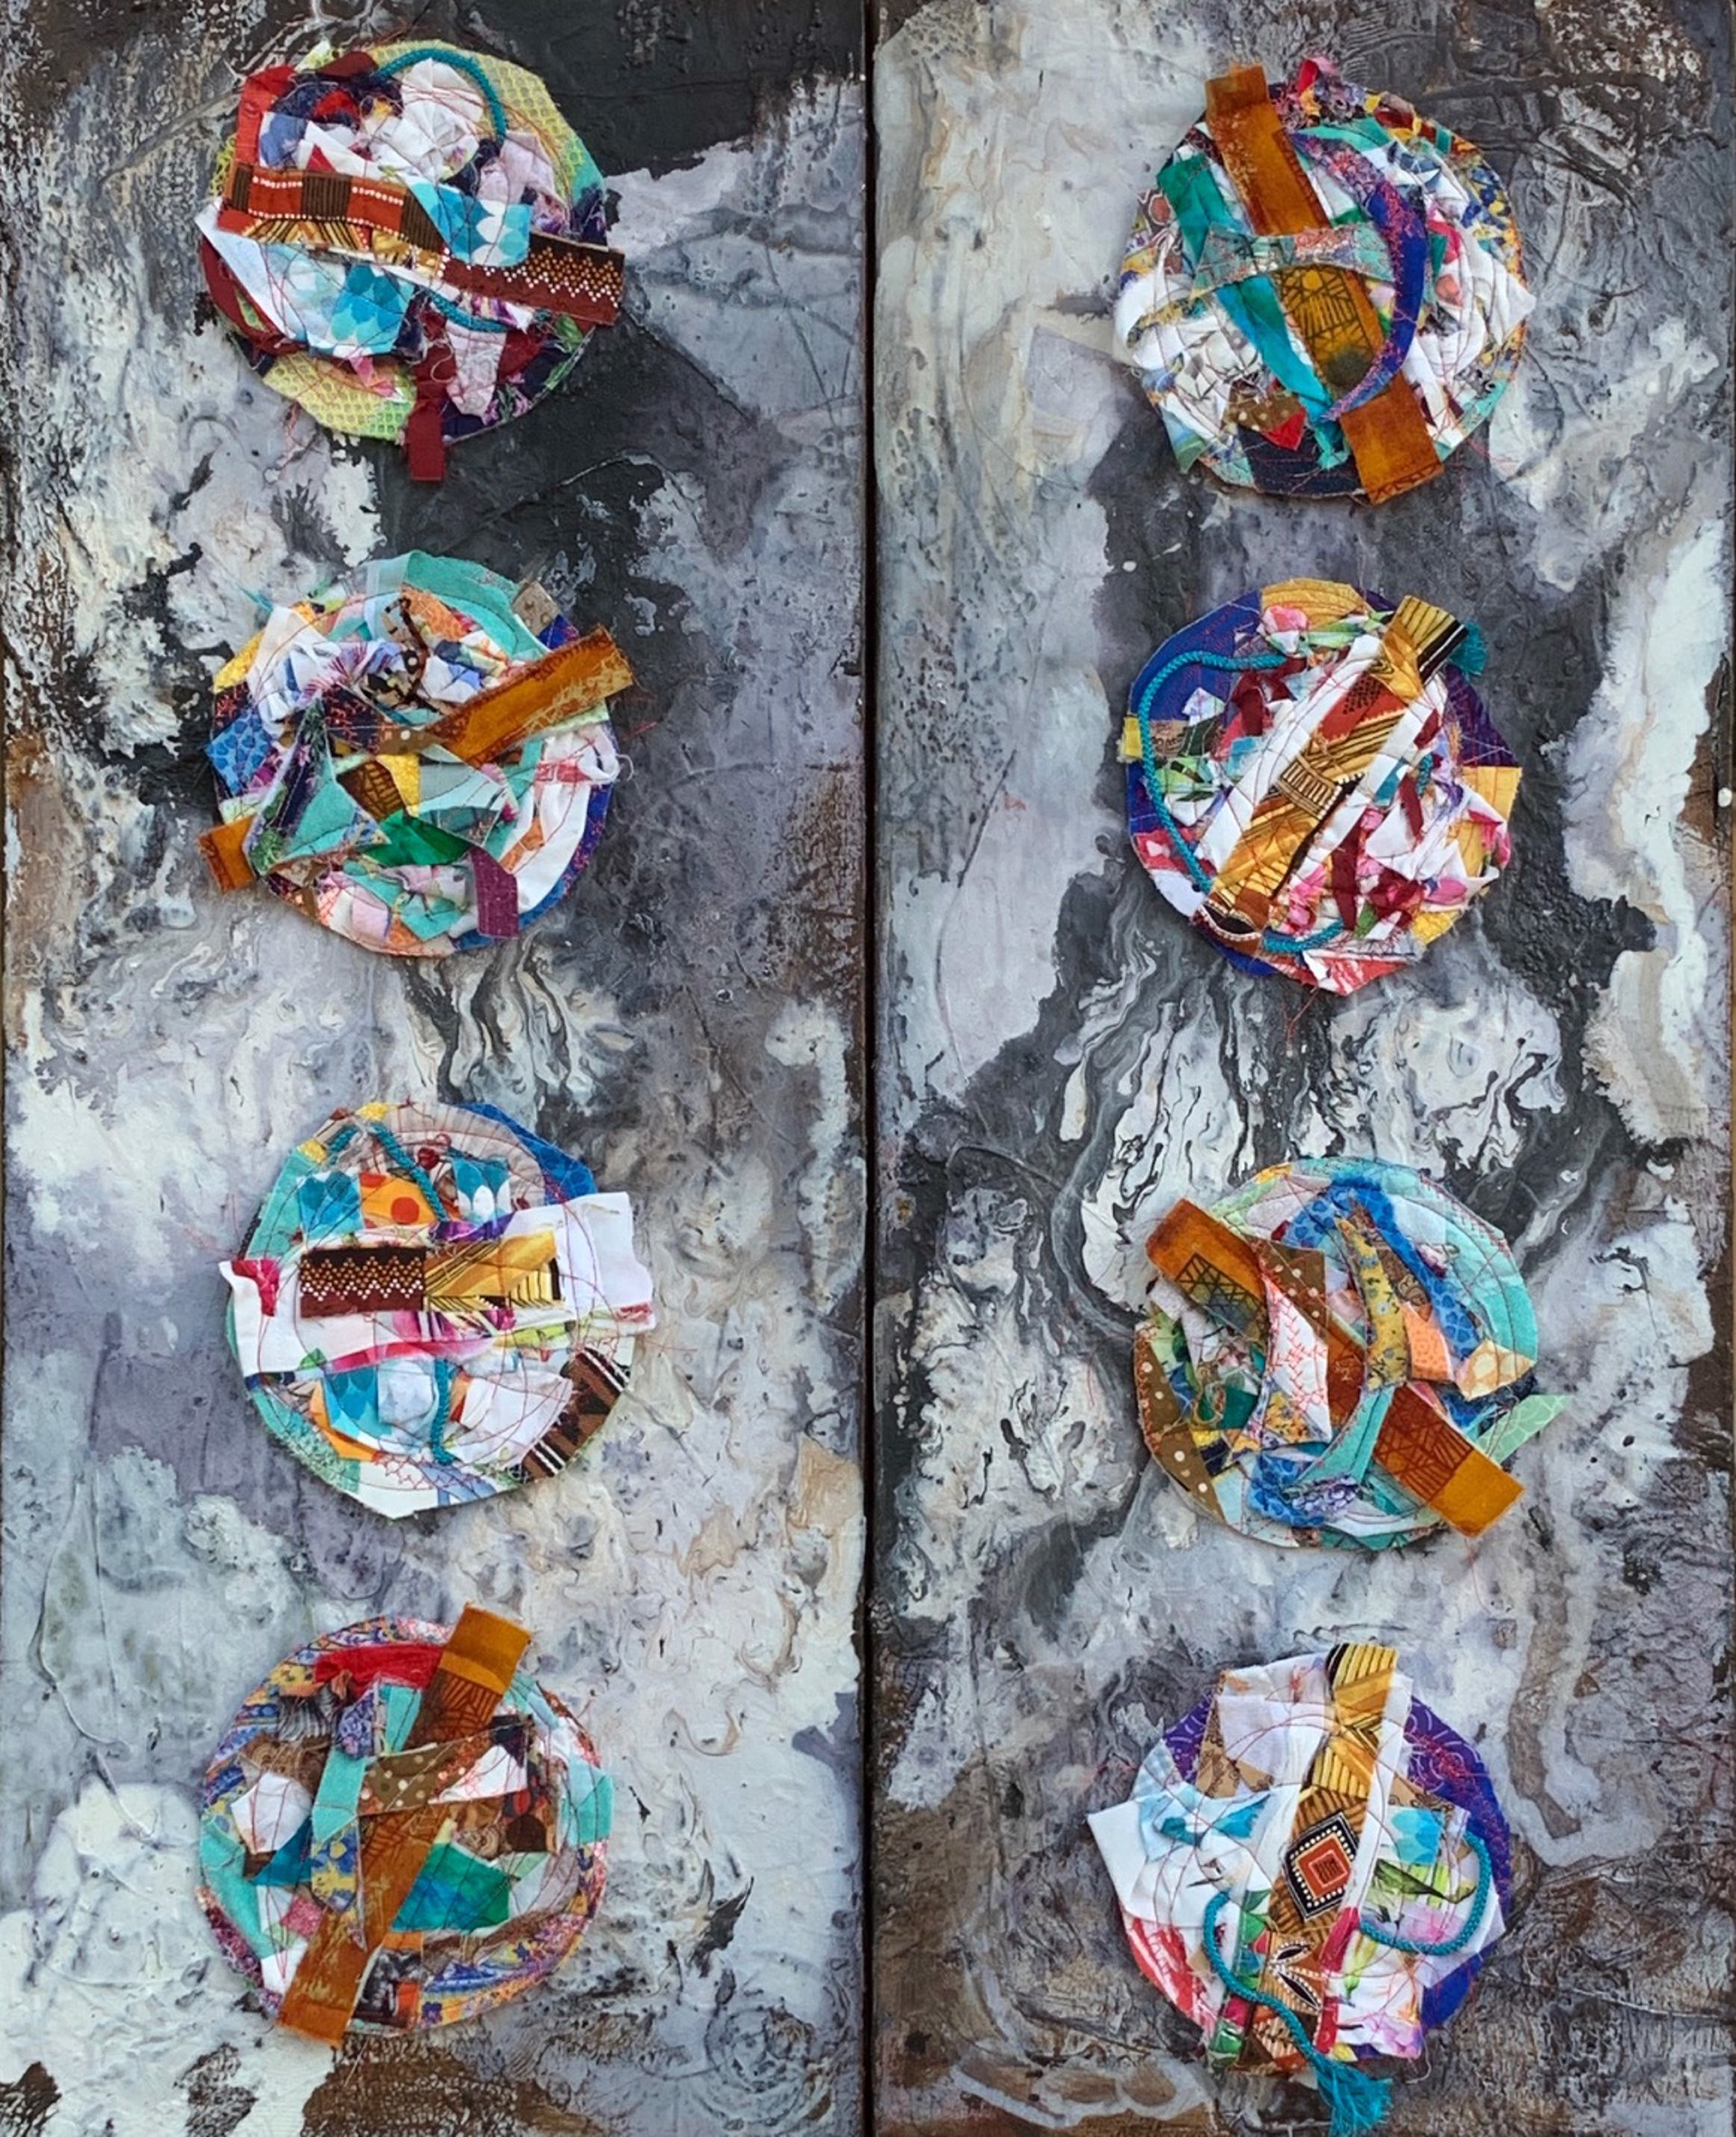 Worlds (2 Panel) by Jennifer Blalack